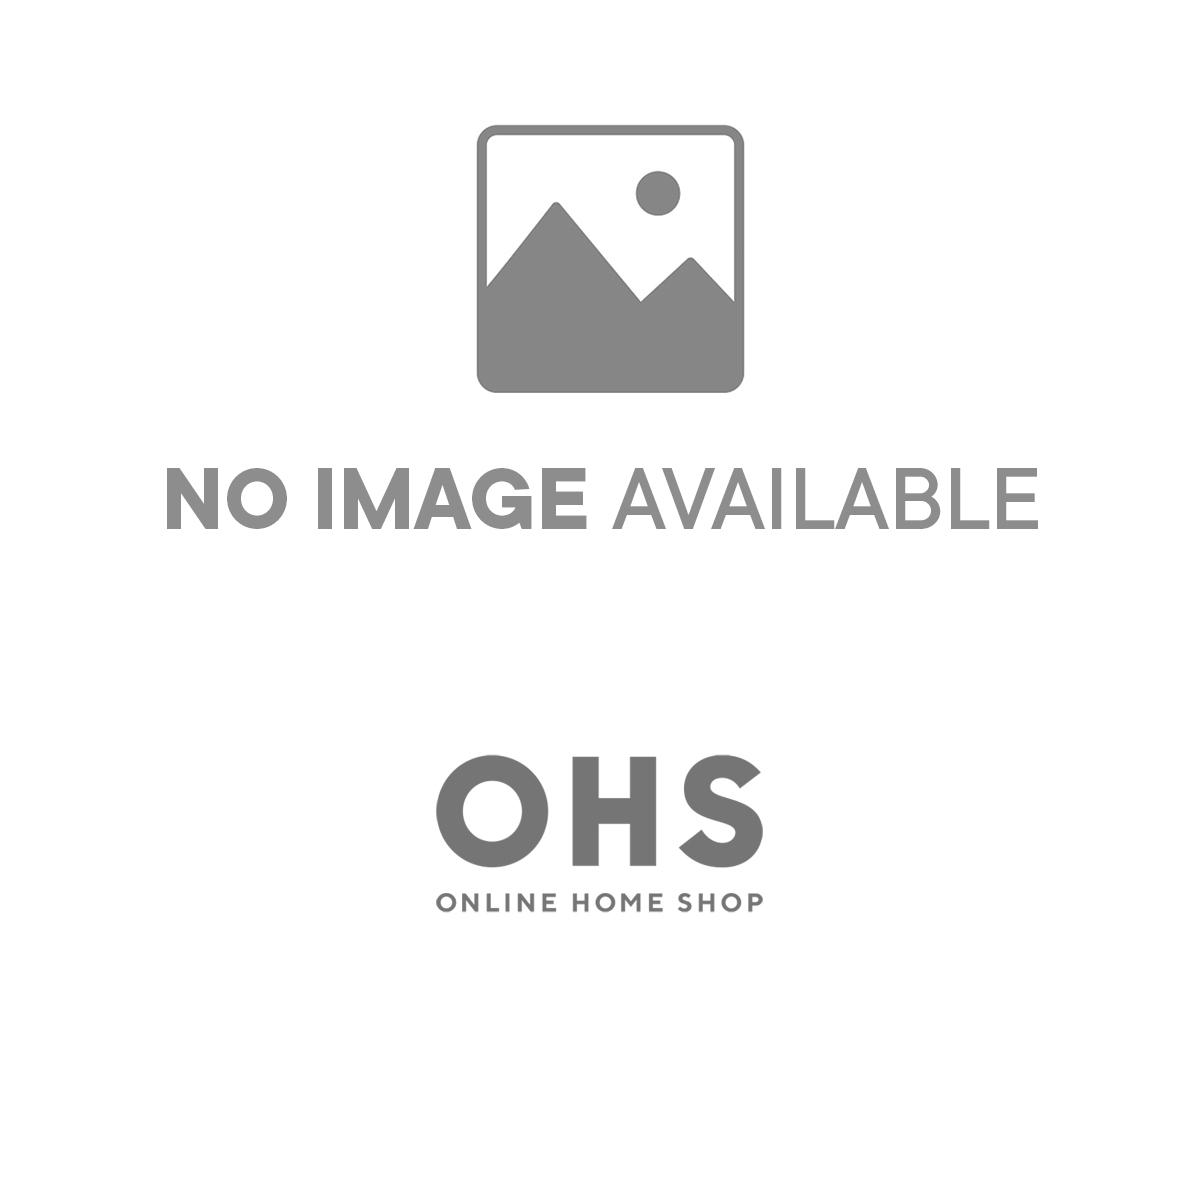 Dreamscene Follow Your Dreams Single Duvet Cover Set - Natural